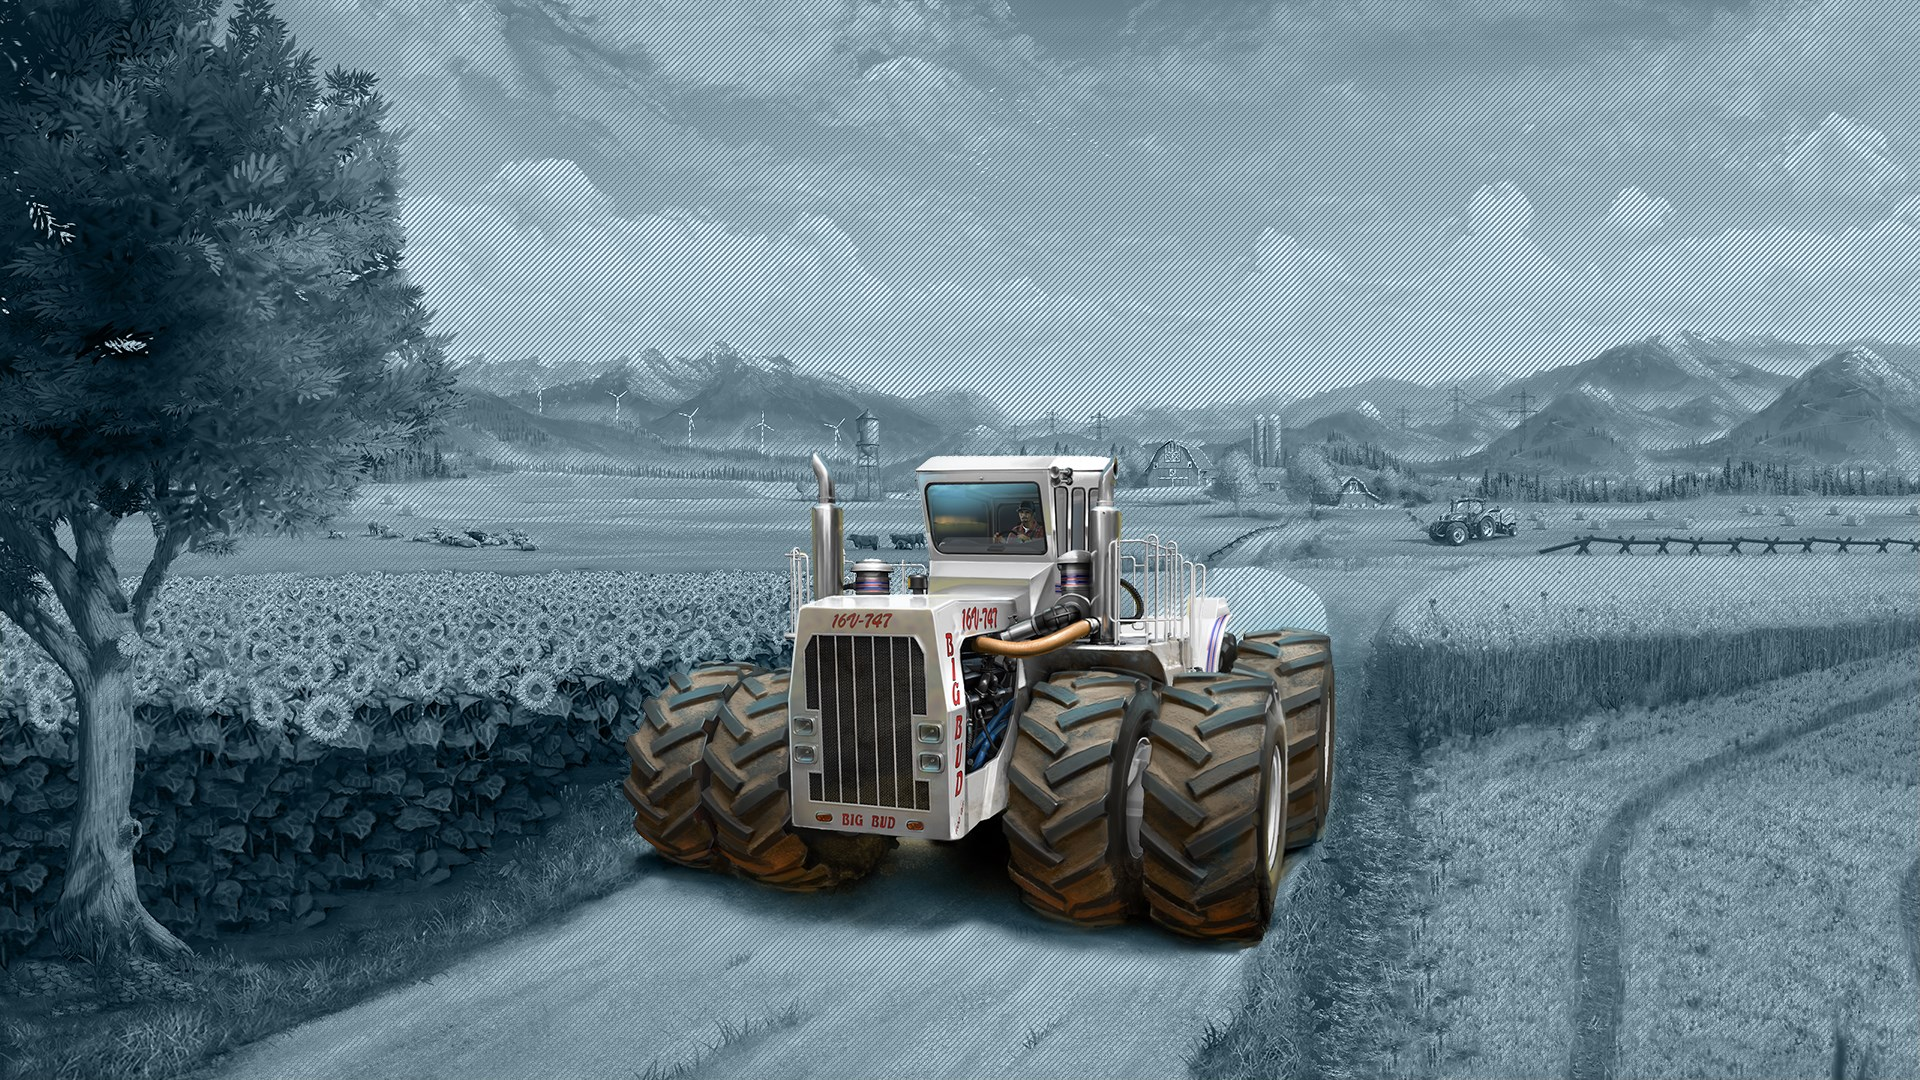 Farming Simulator 17: BIG BUD Pack